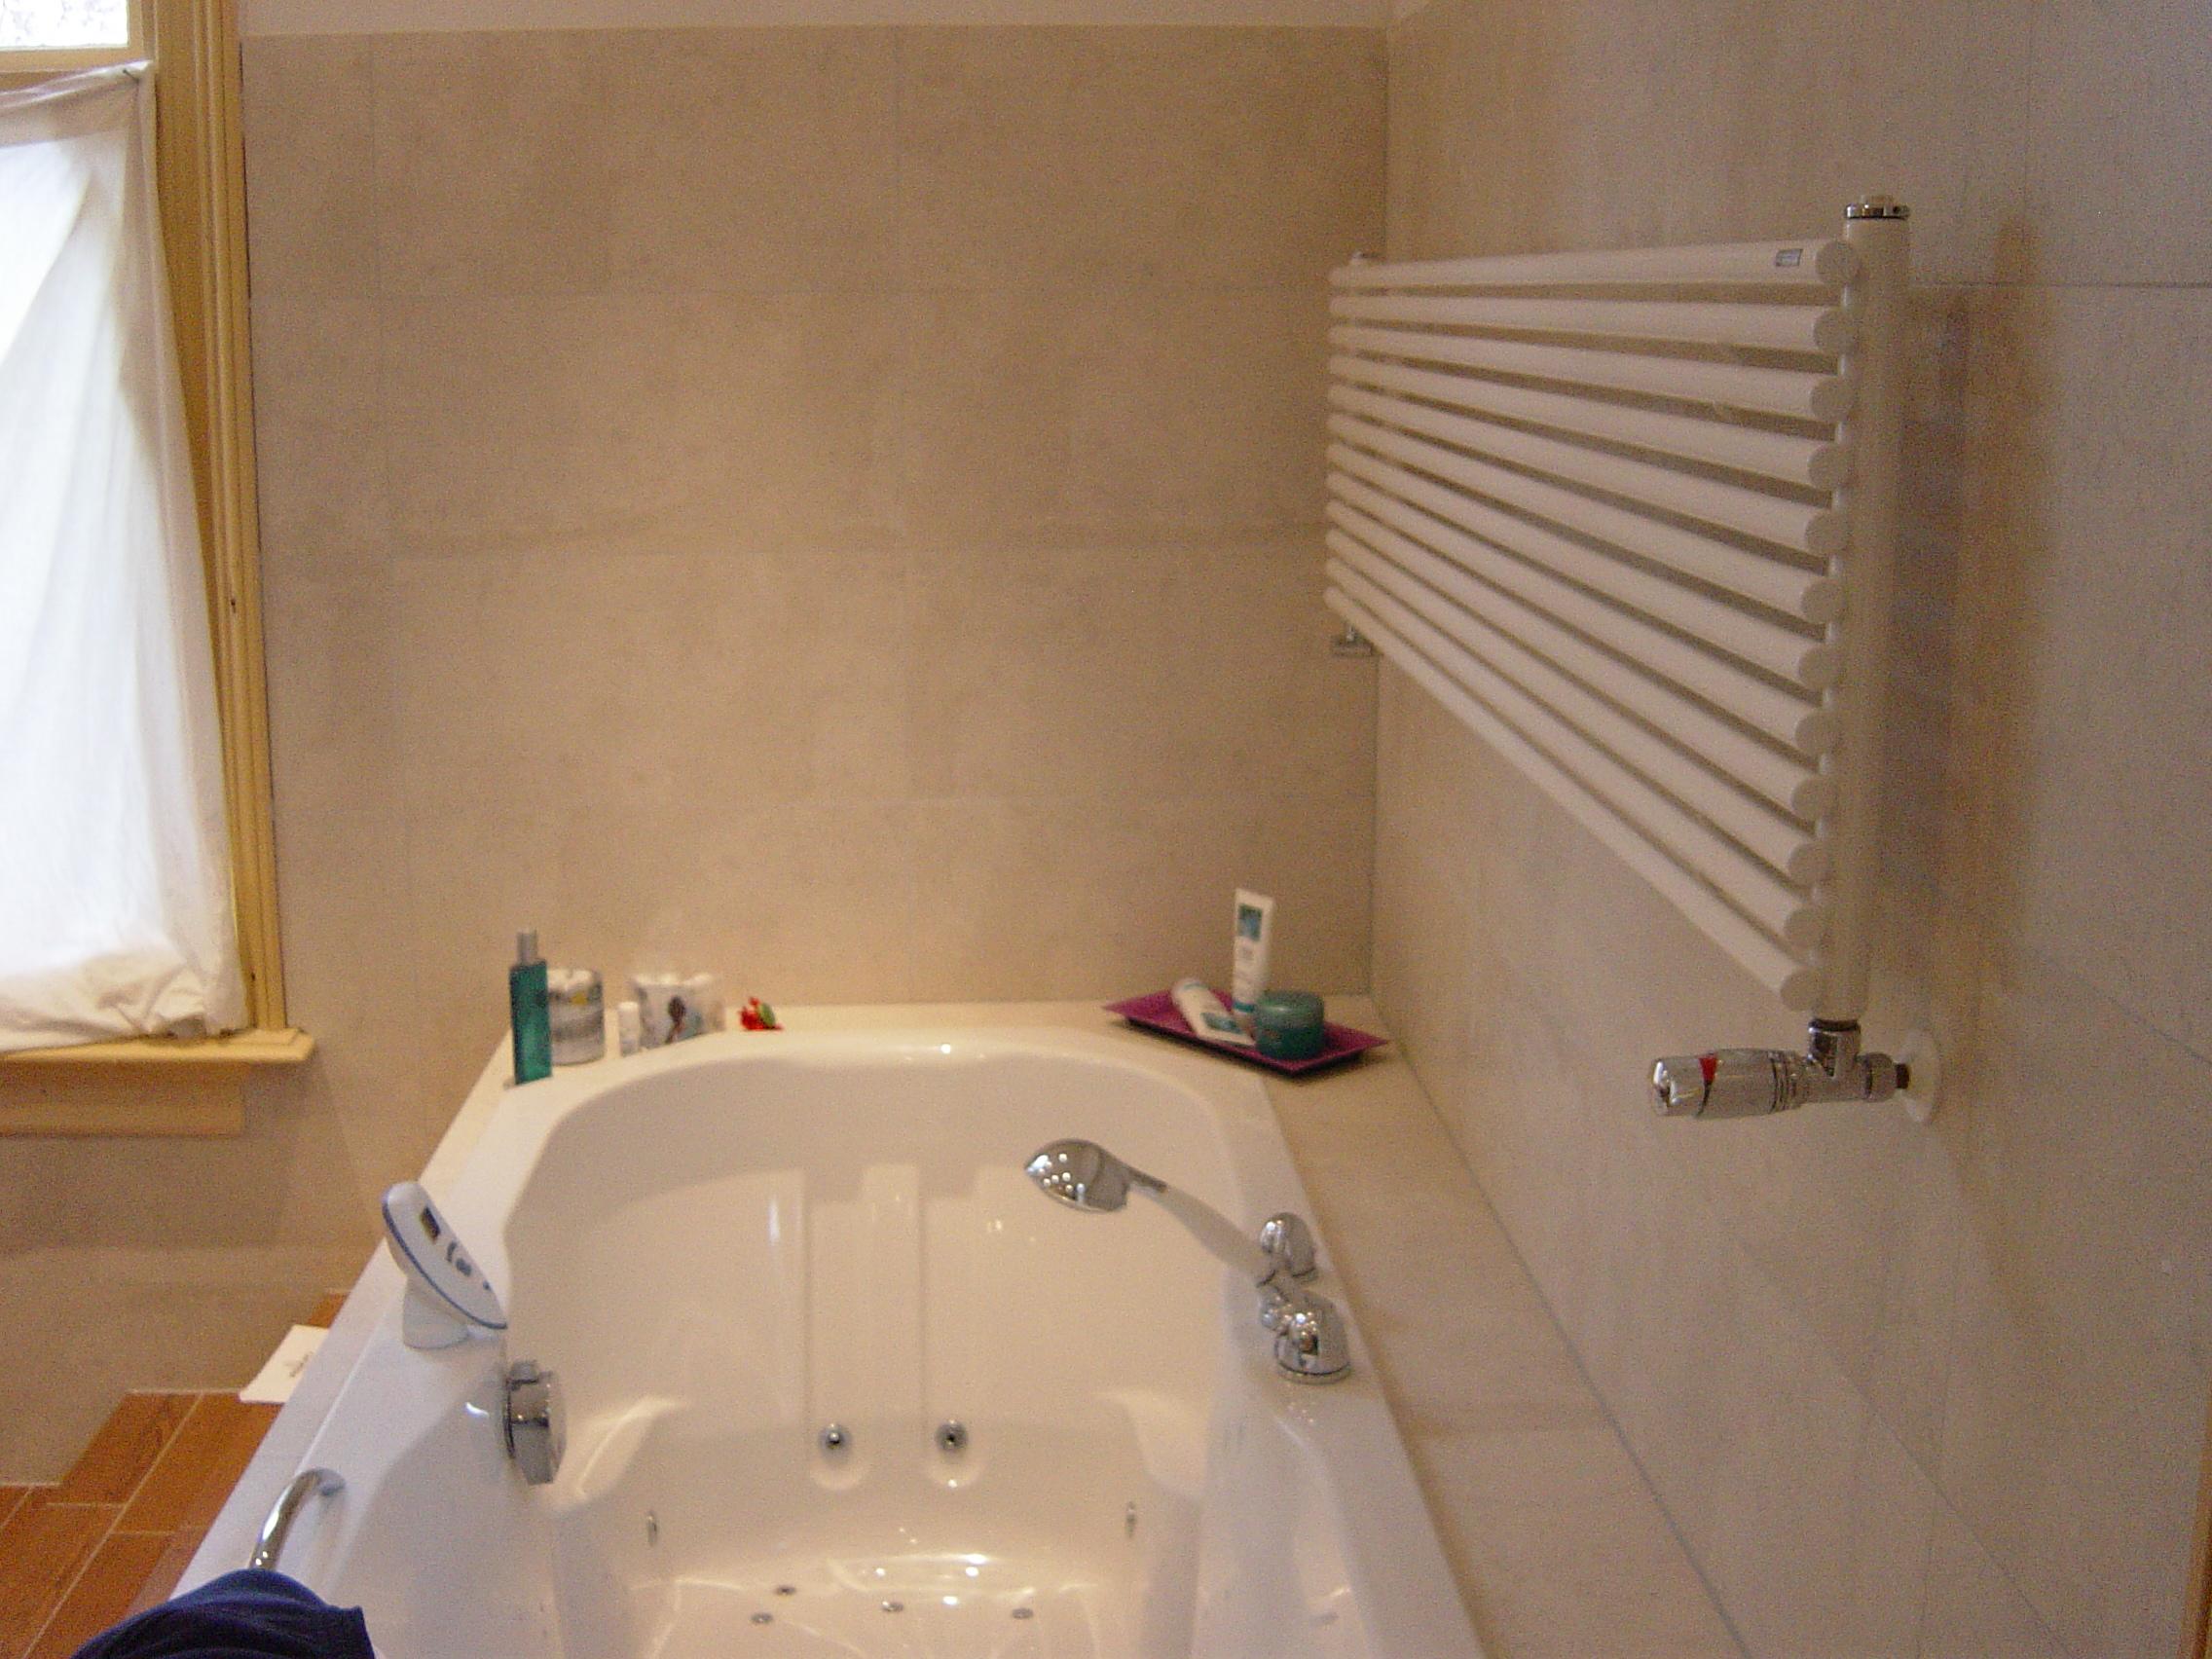 Keuken Badkamer Apeldoorn : Fotogalerij klusvertrouwd soest badkamer keuken of verbouwing